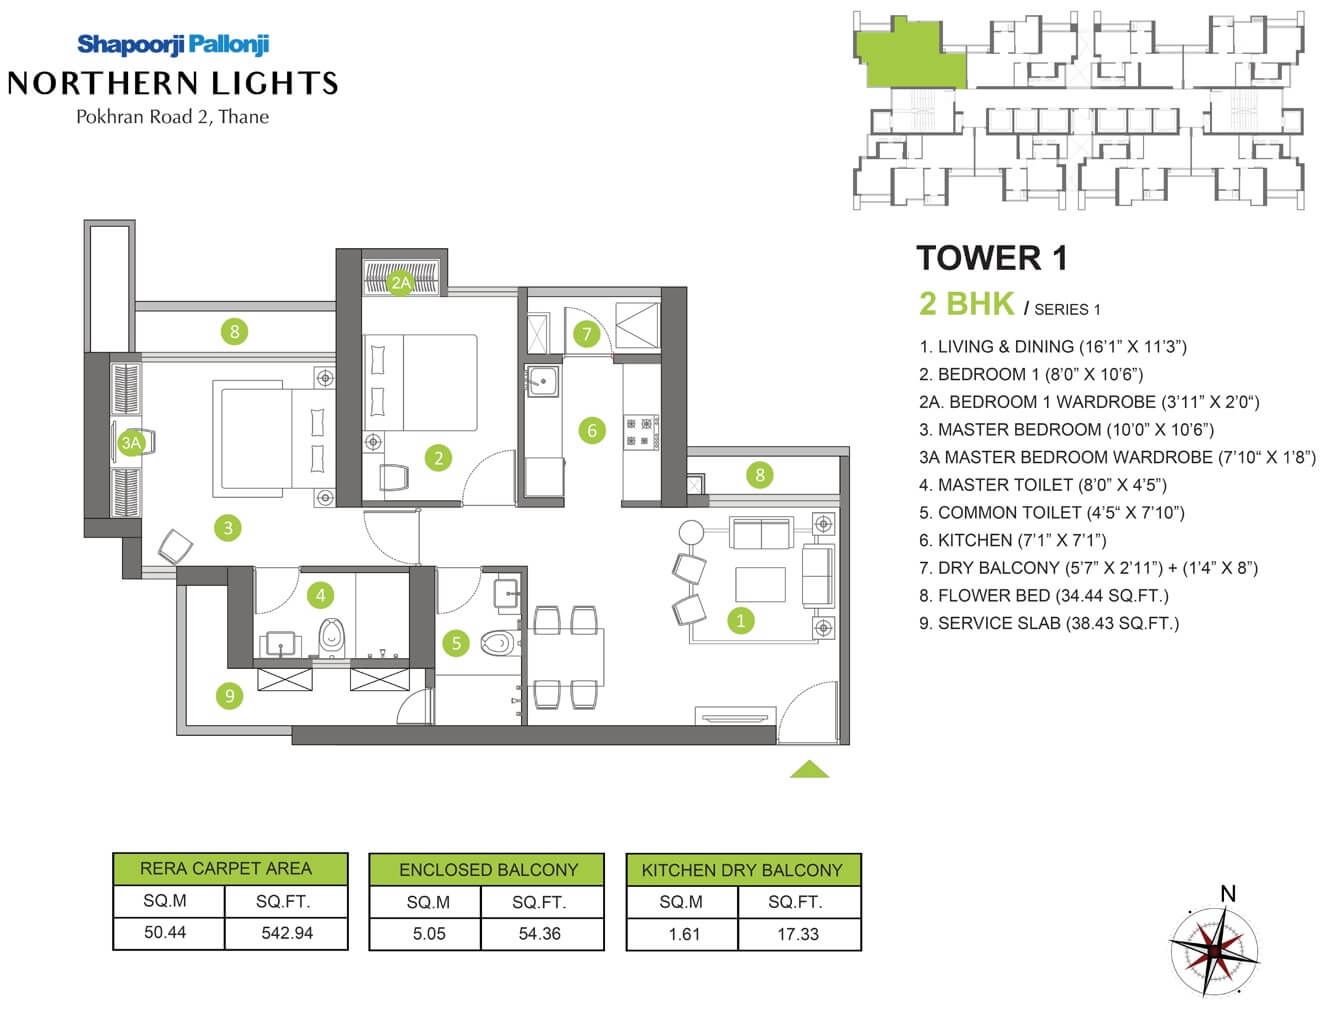 shapoorji pallonji northern lights apartment 2bhk 542sqft 1